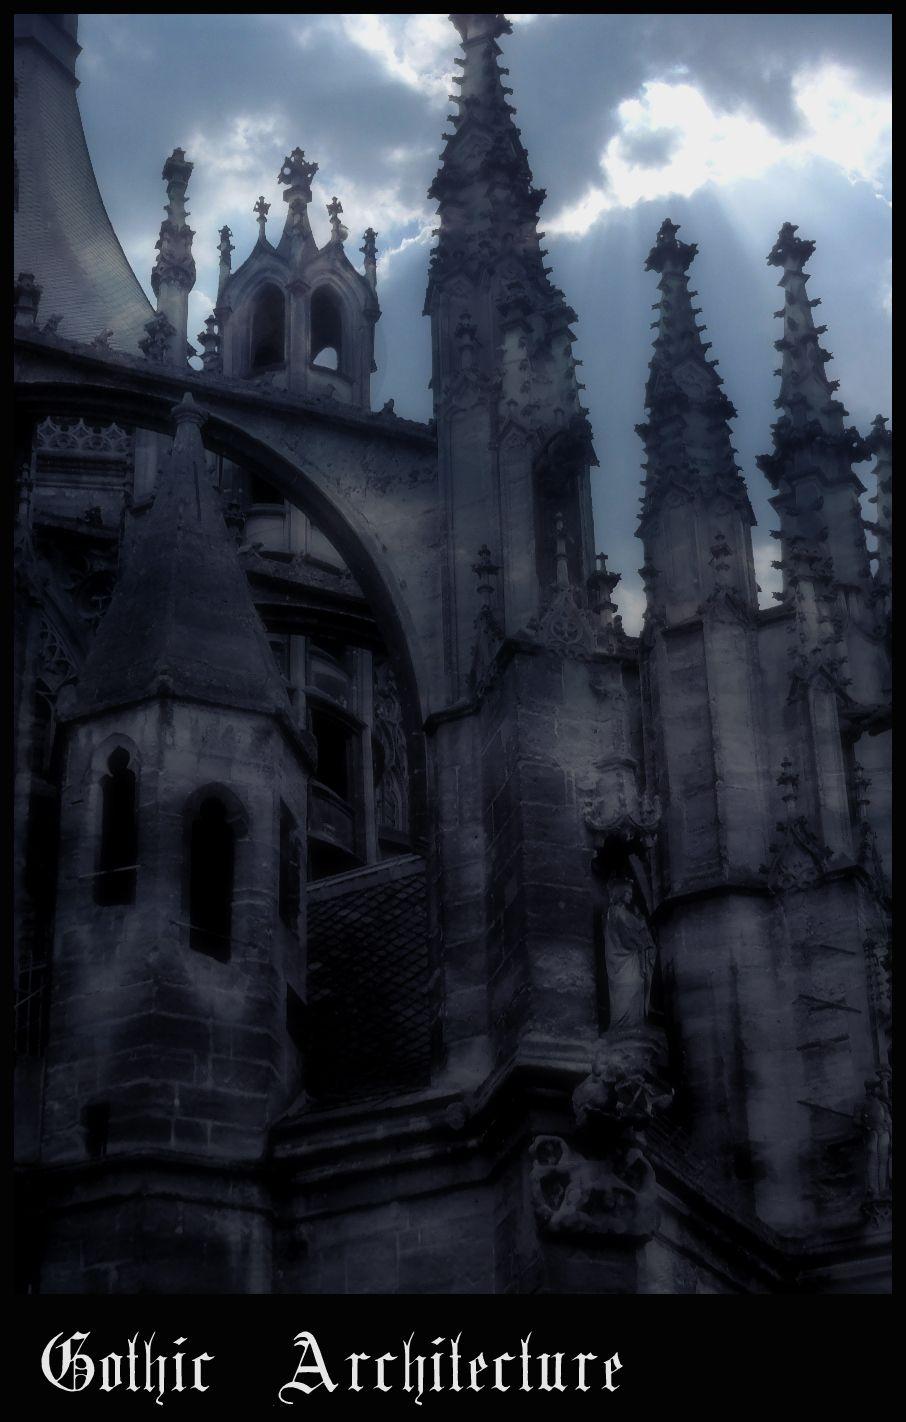 Google Image Result for http://www.deviantart.com/download/16672685/Gothic_Architecture_by_NymeriaVonHermoder.jpg